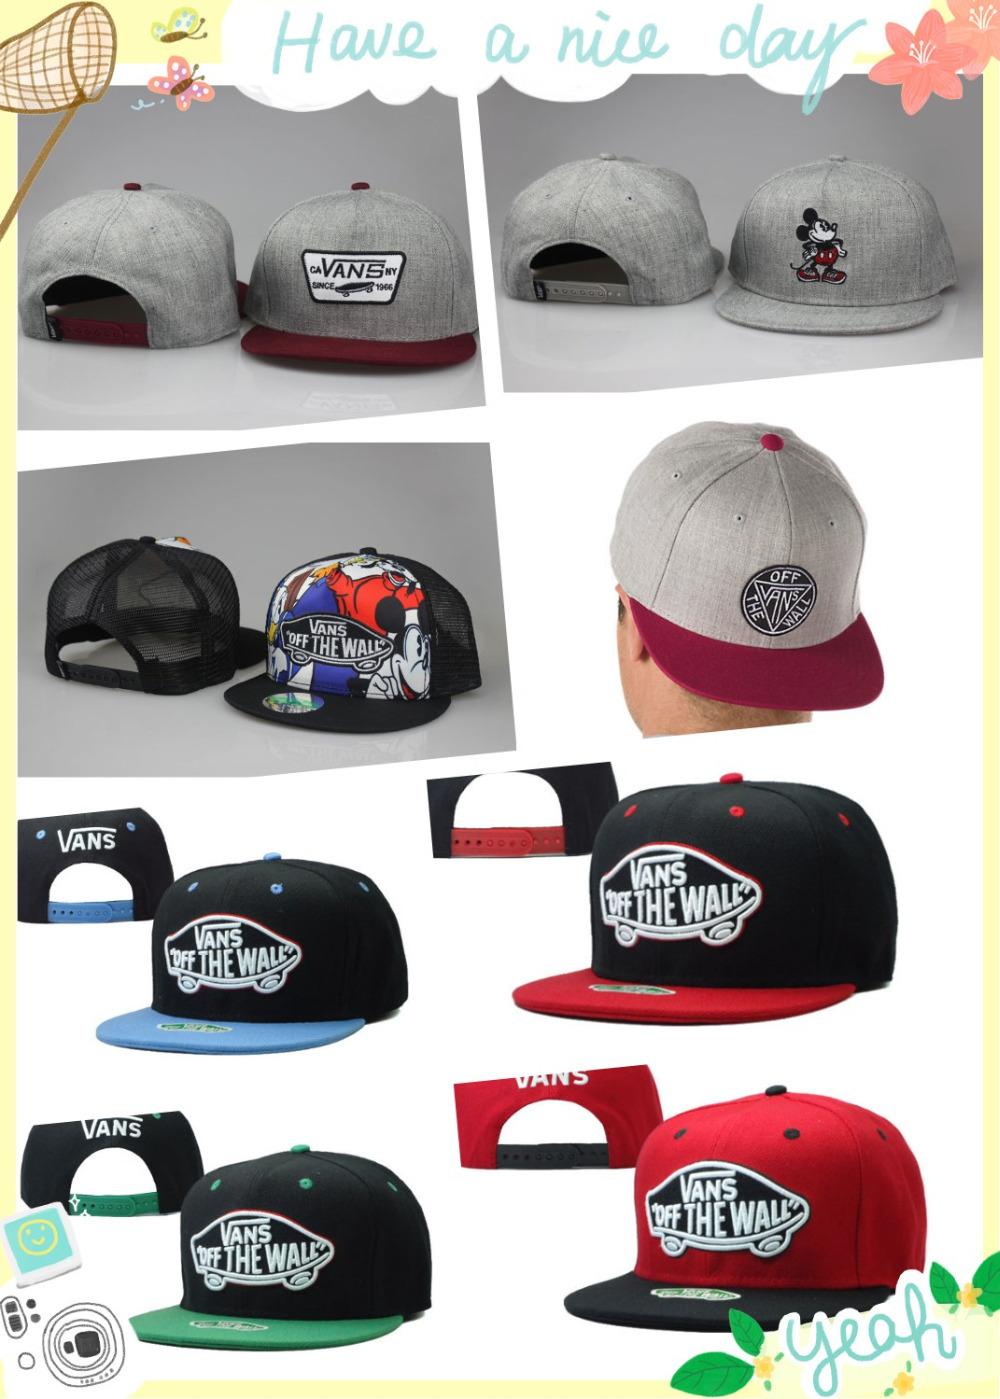 Gorras Vanses снэпбэк шляпа бейсбол хип-хоп спорт шапки для мужчины женщины регулируемый